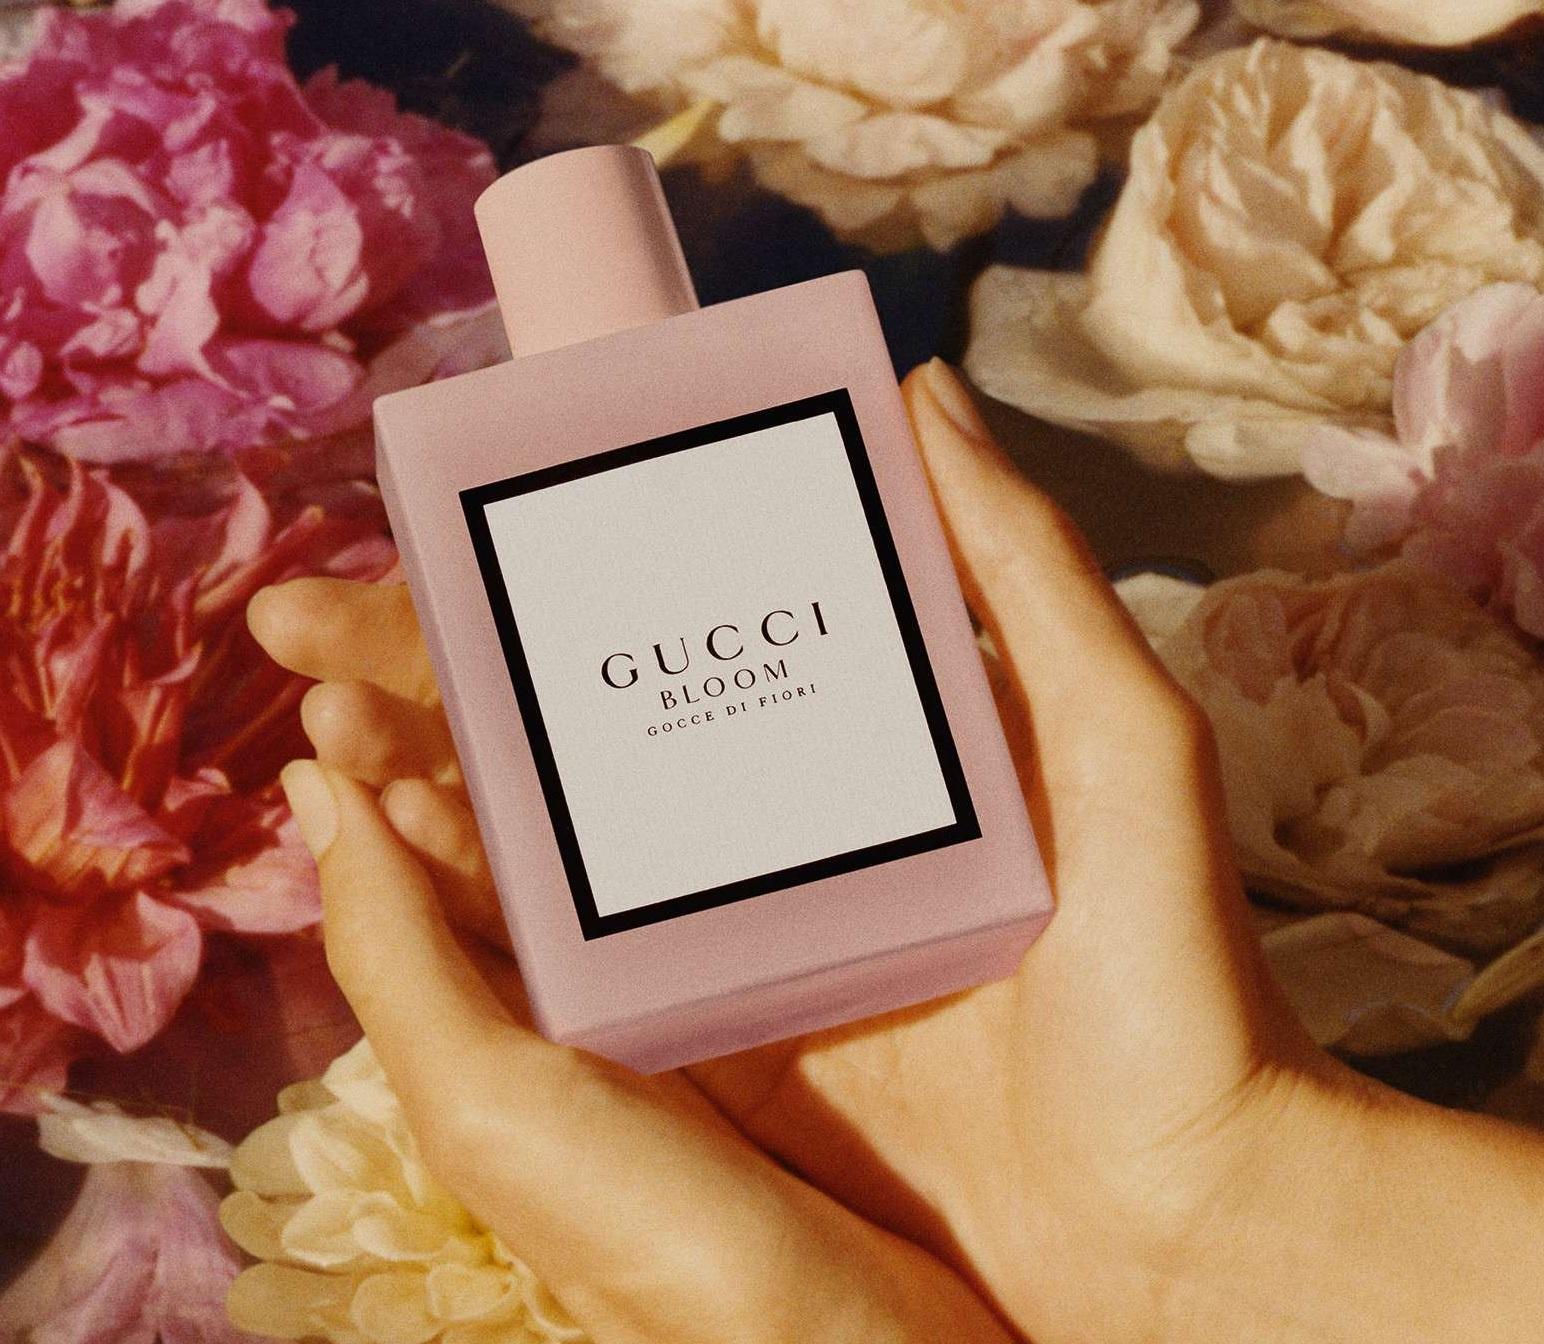 d87df7c26491 Gucci Bloom Gocce di Fiori ~ New Fragrances